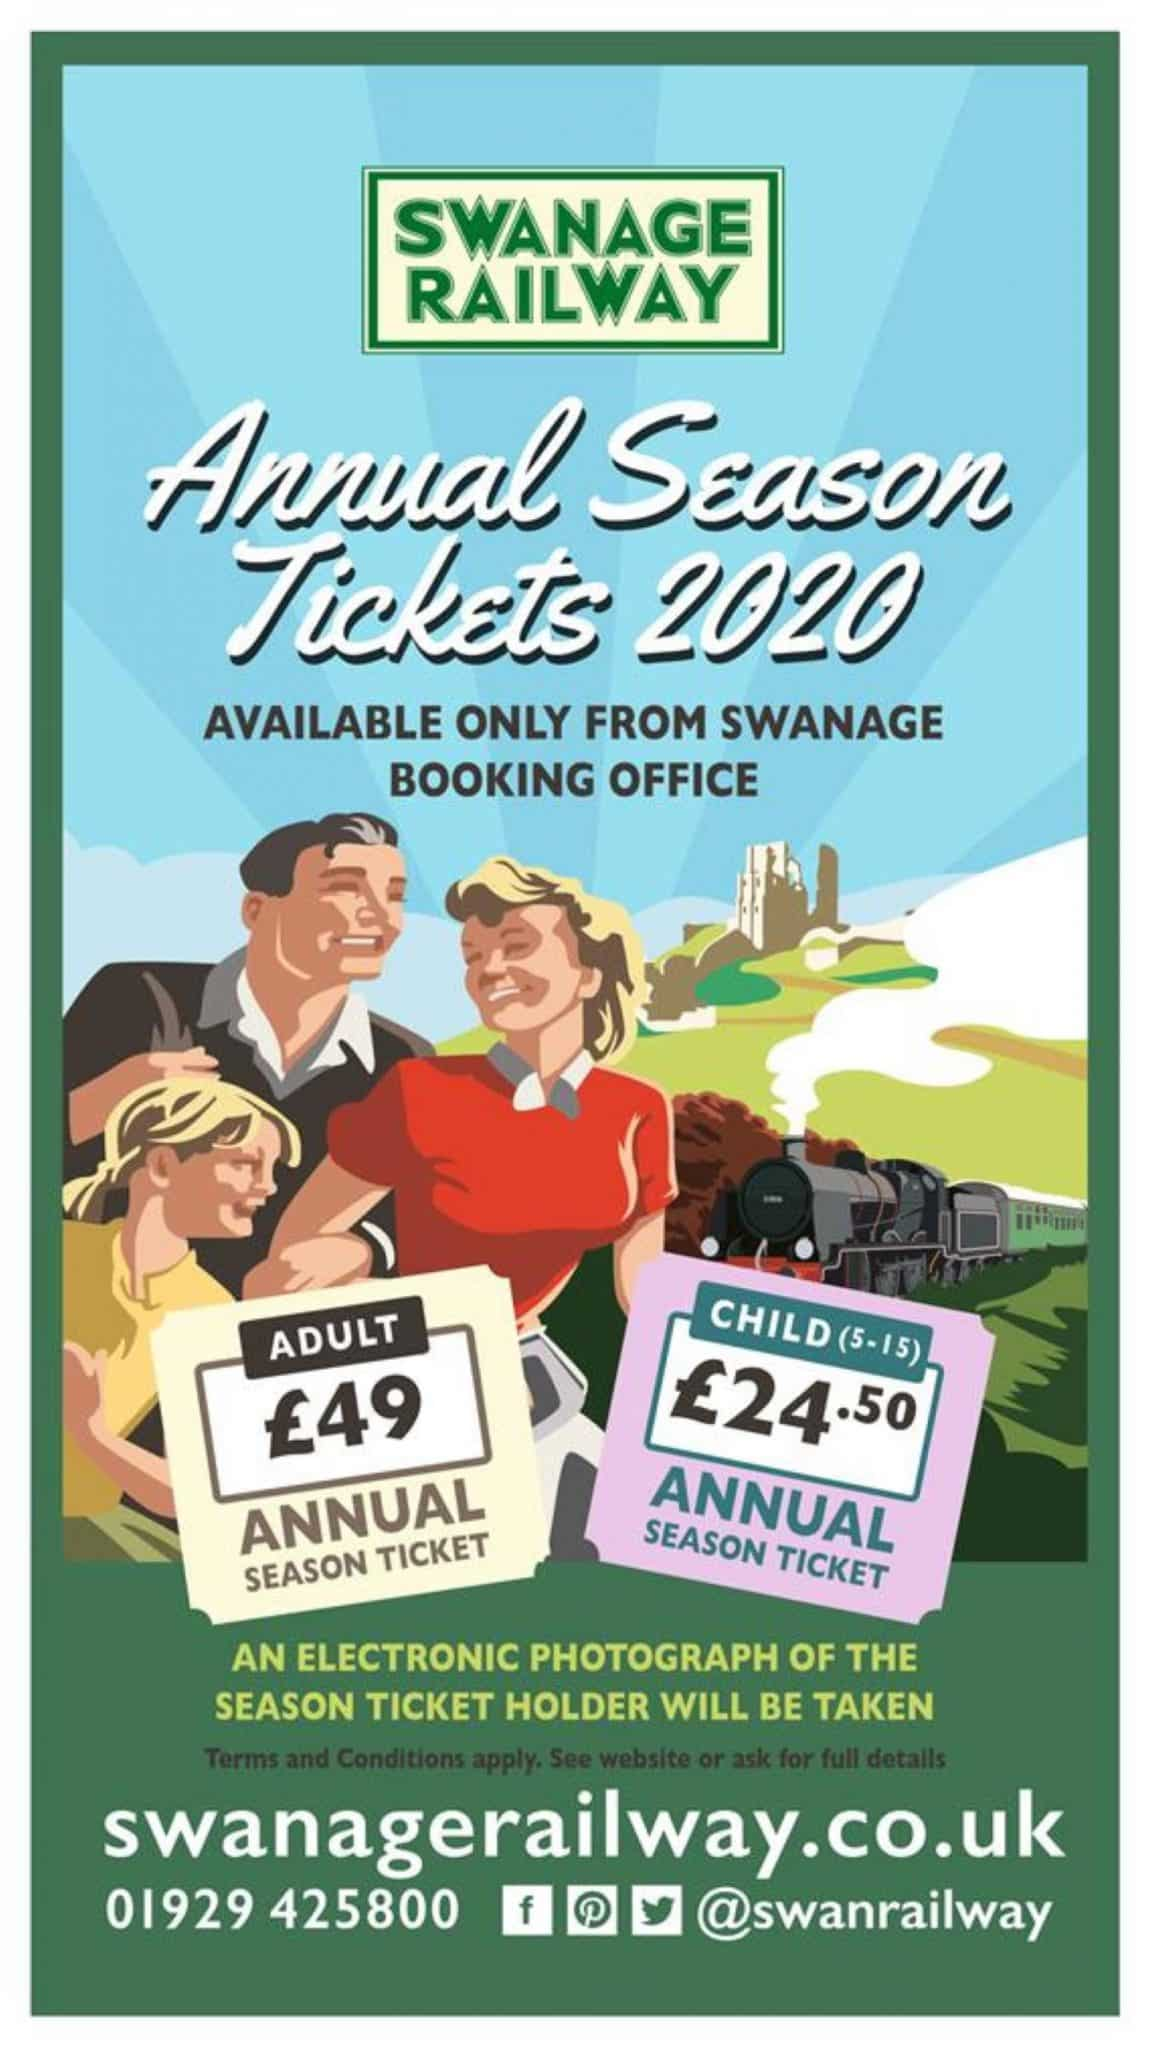 Annual Season Ticket // Credit Swanage Railway